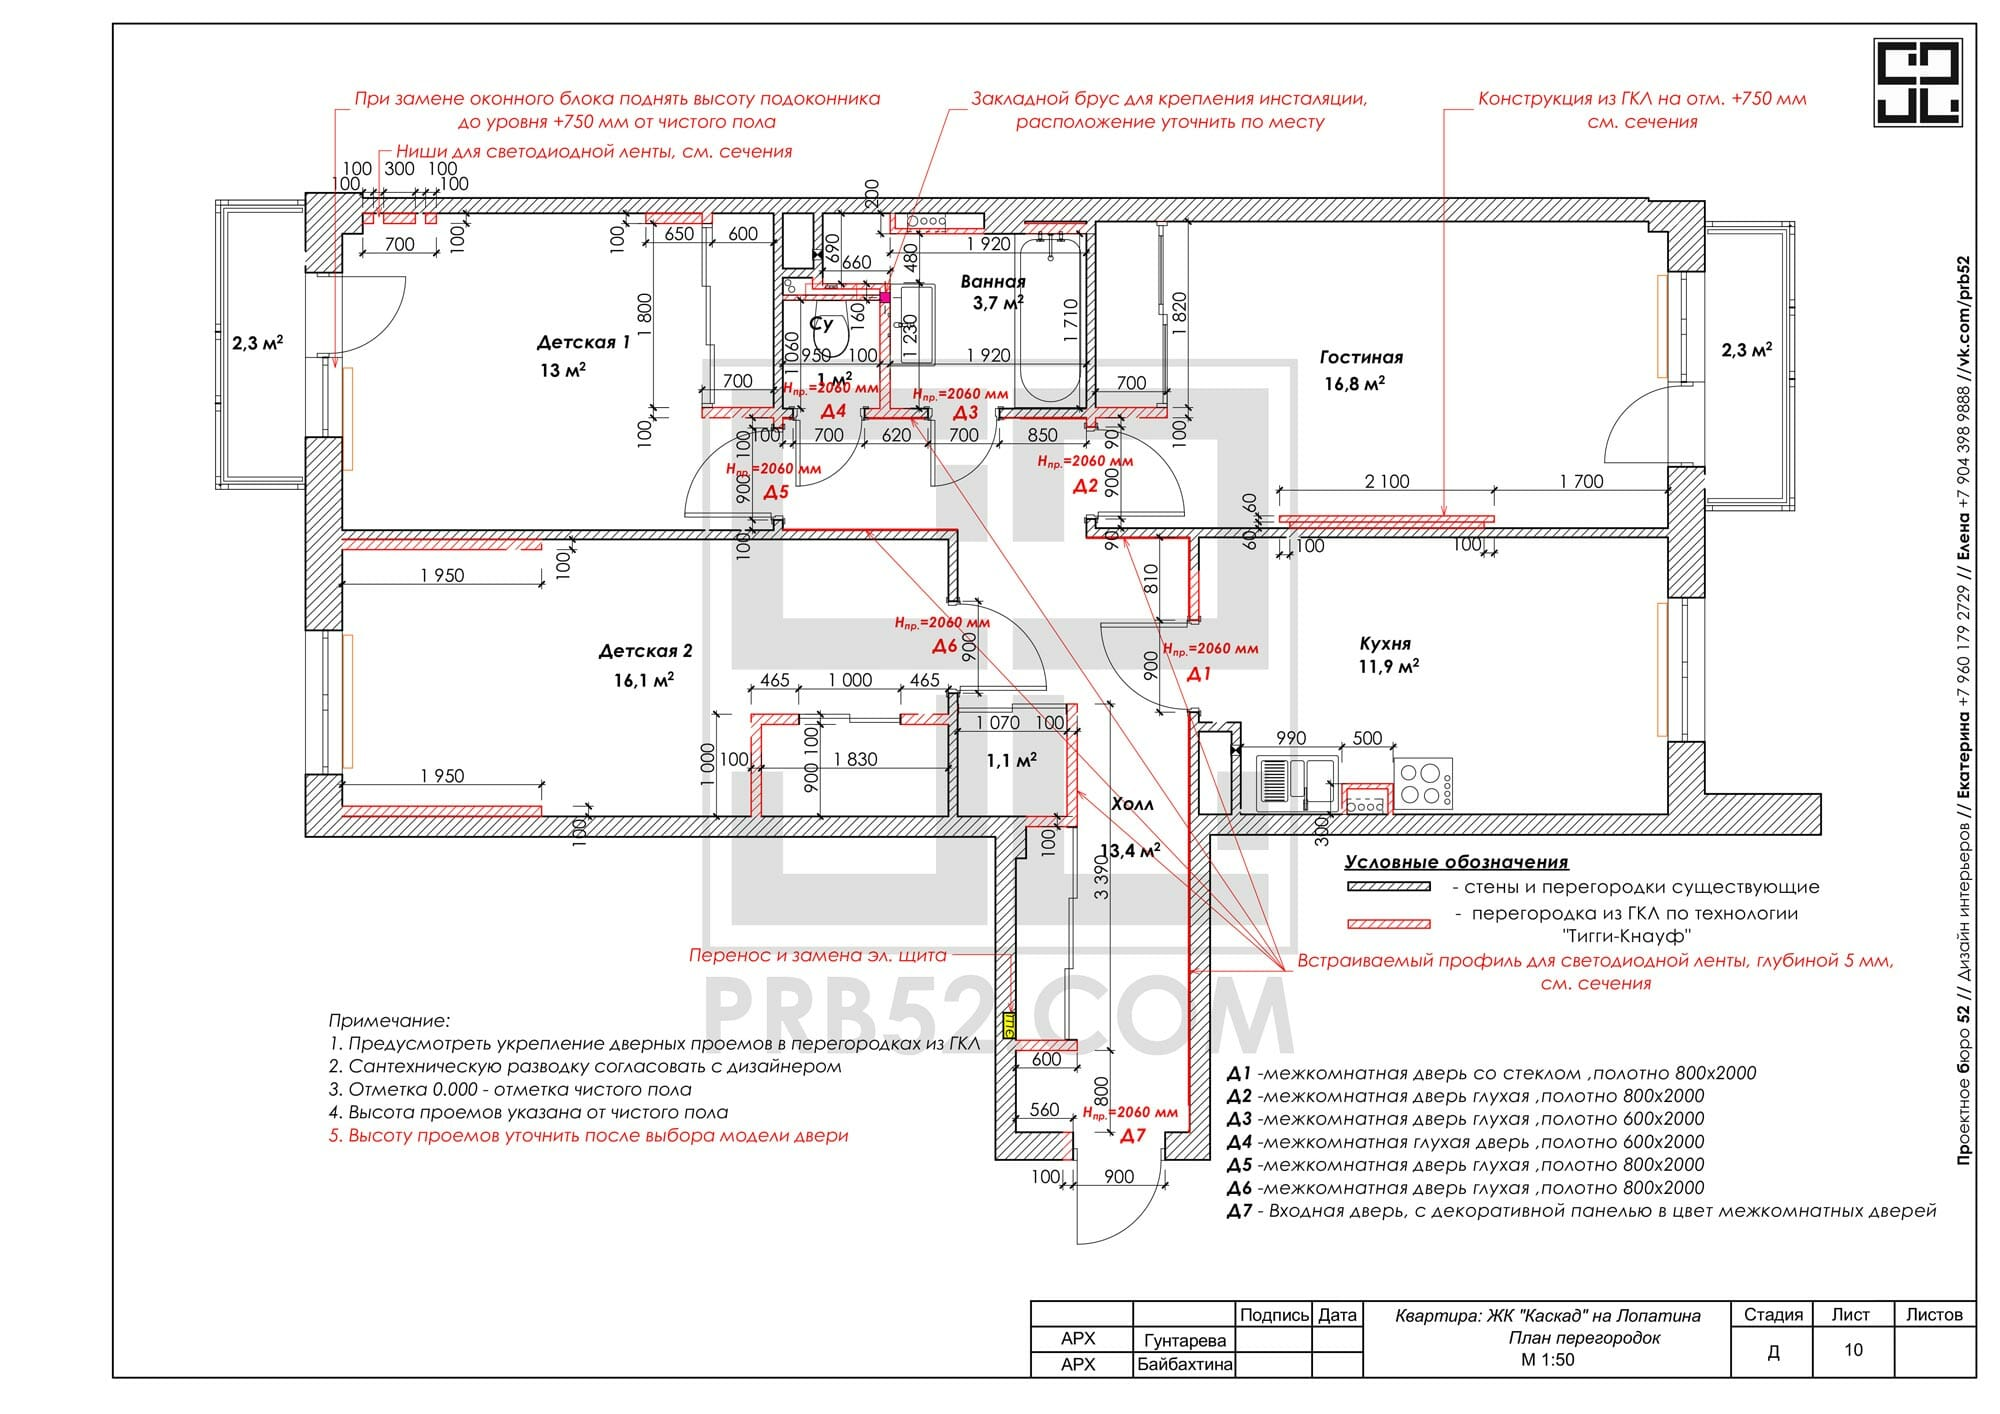 дизайн интерьера планы перегородок стен монтажа и демонтажа